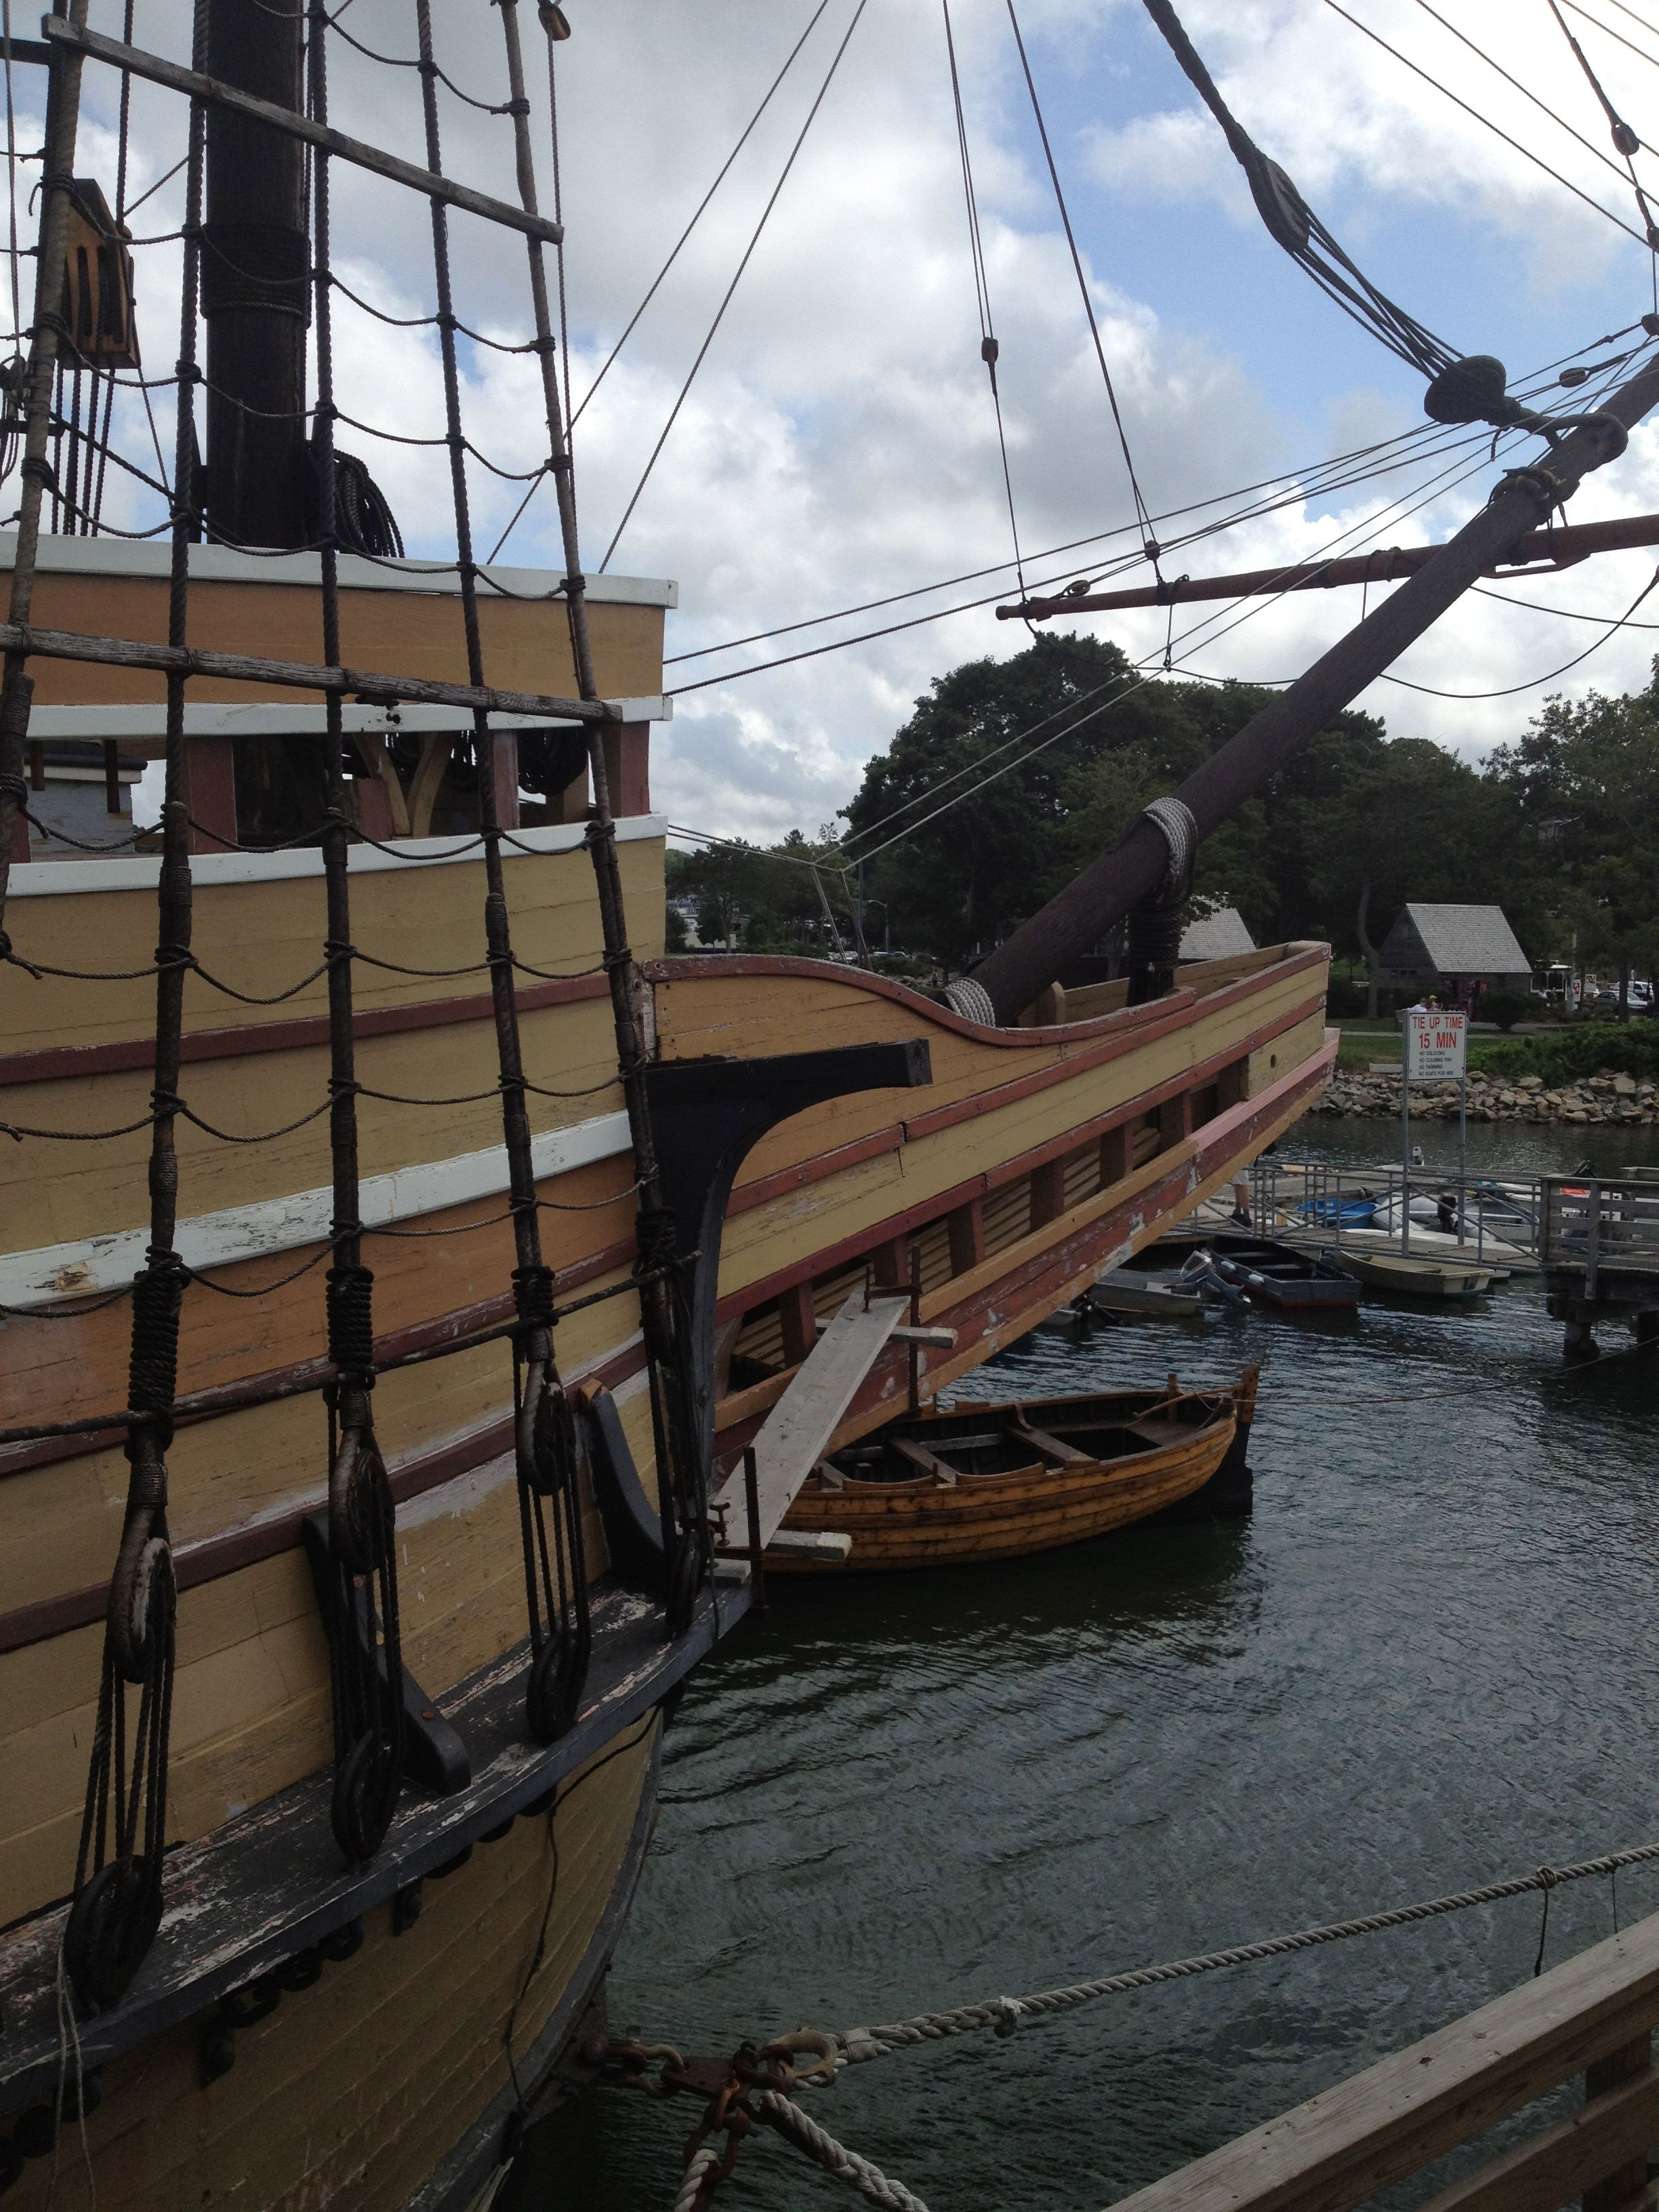 Mayflower II with dinghyHouse of History, LLC. Mystery